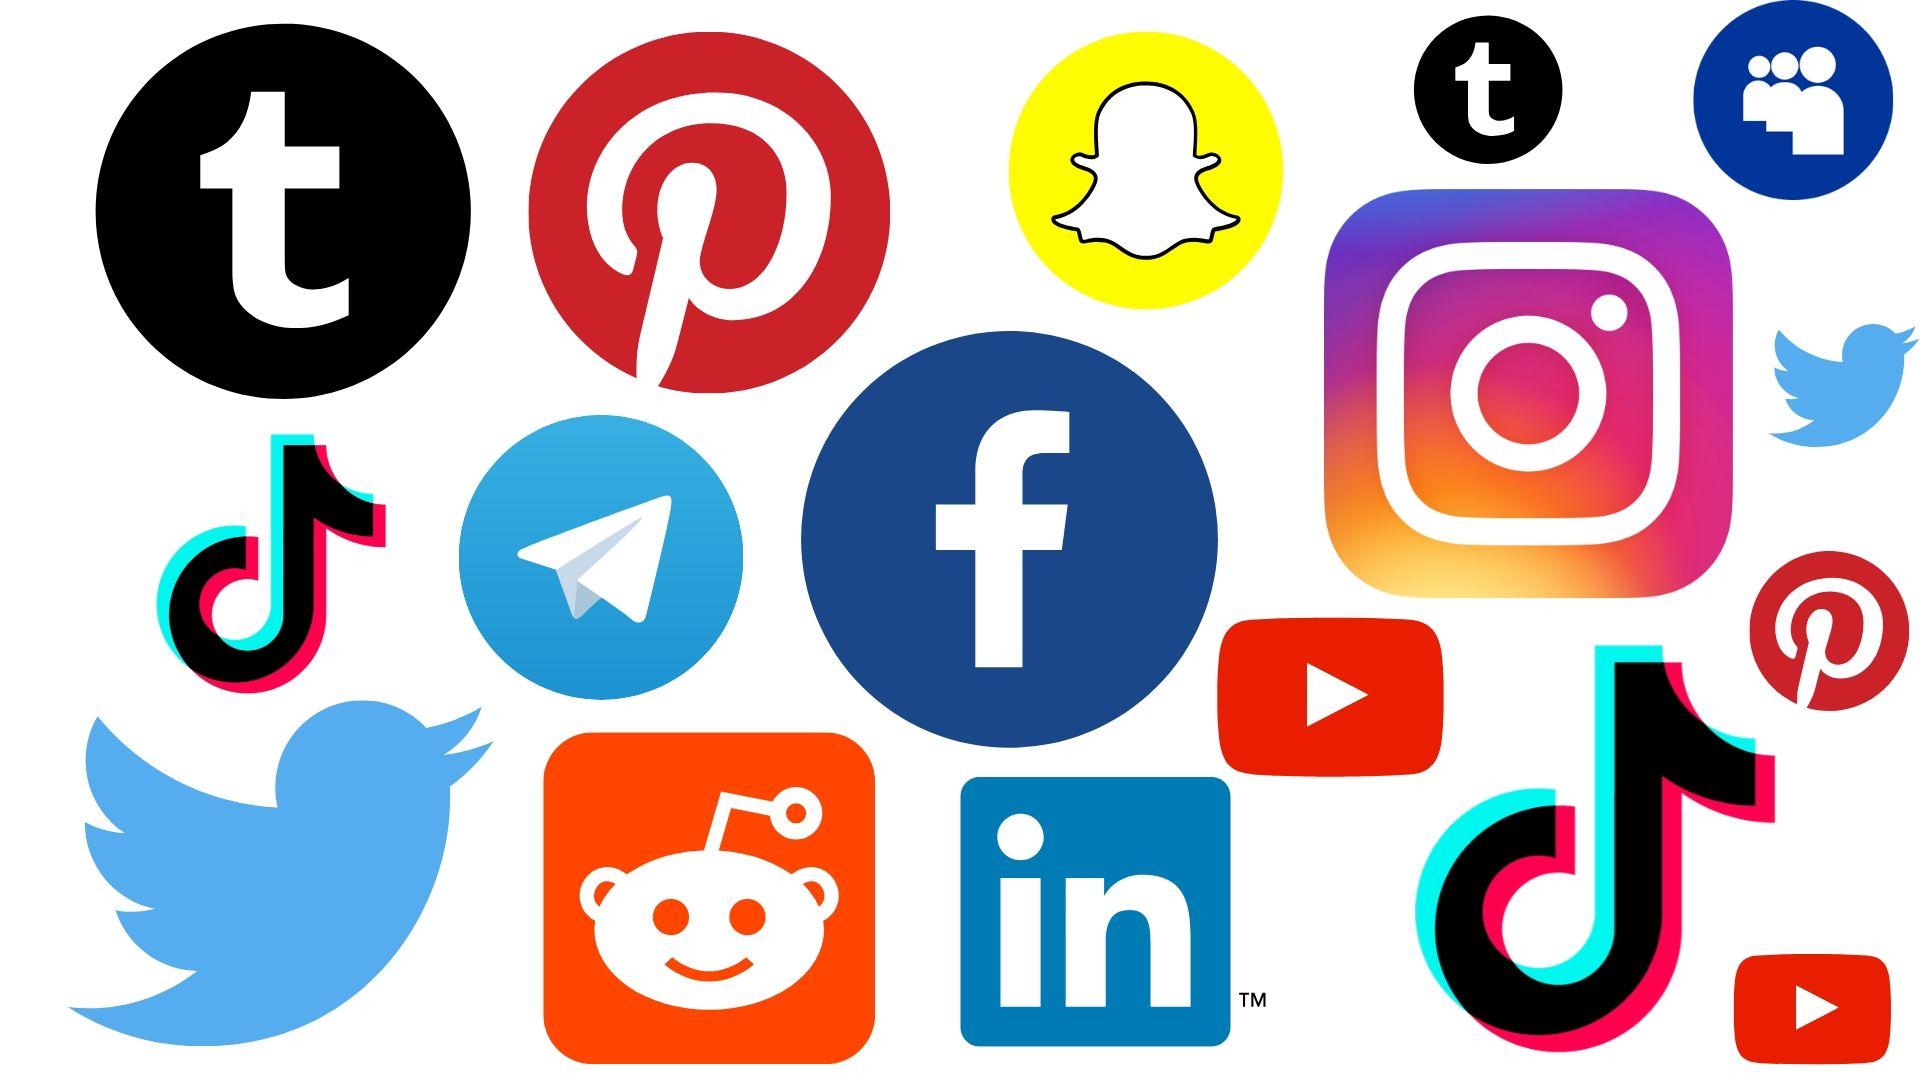 Top 12 Most Popular Social Media Sites In 2021